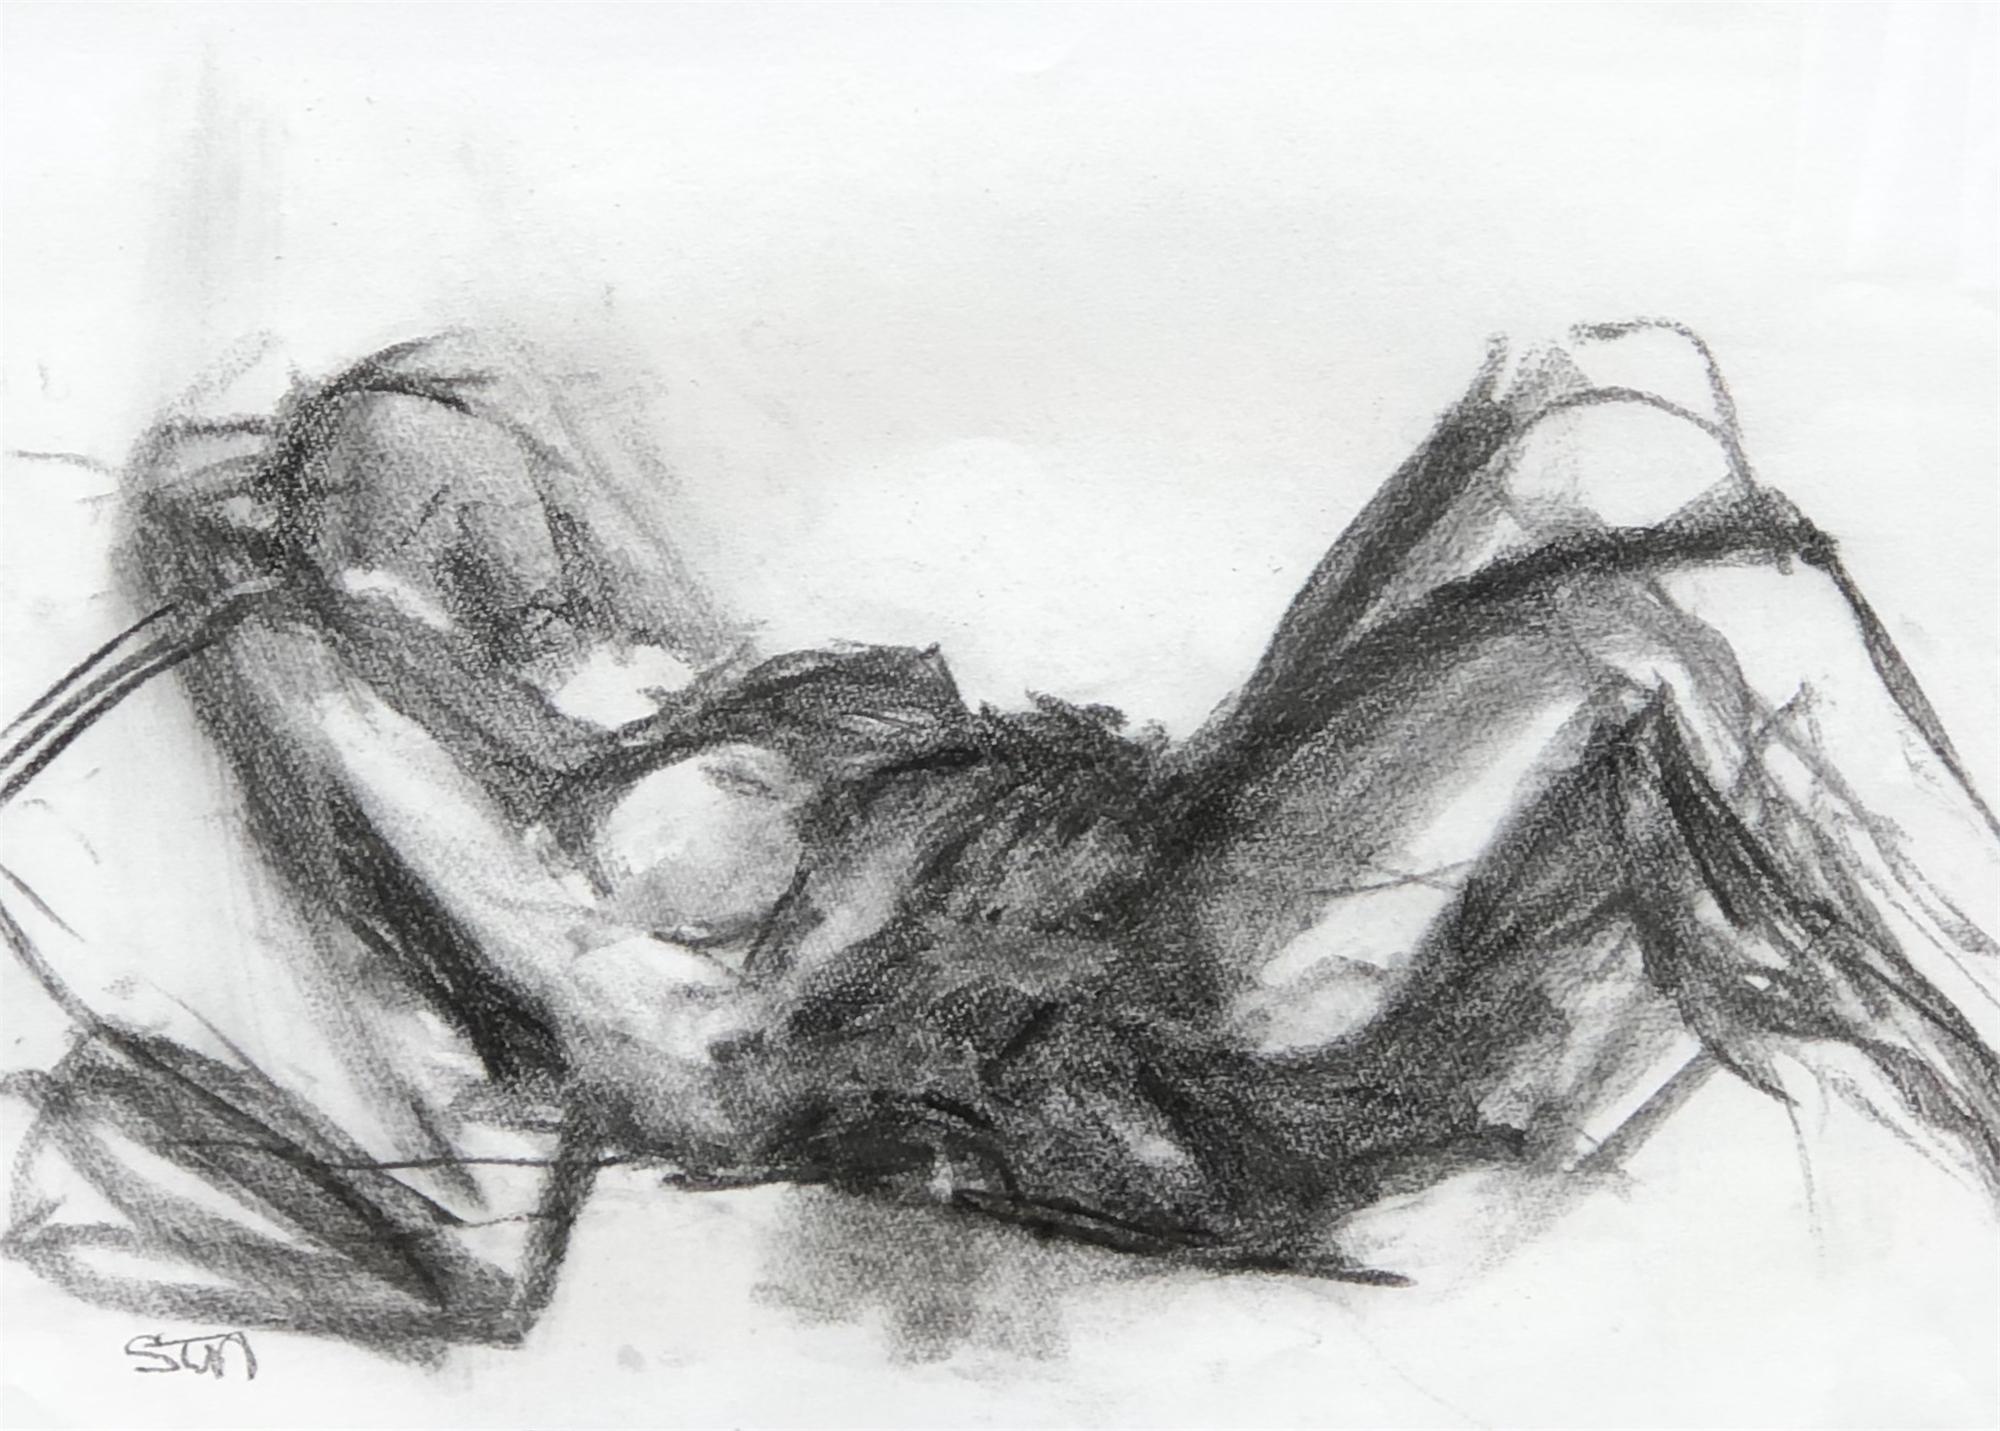 Gestural VI by Susan Altman